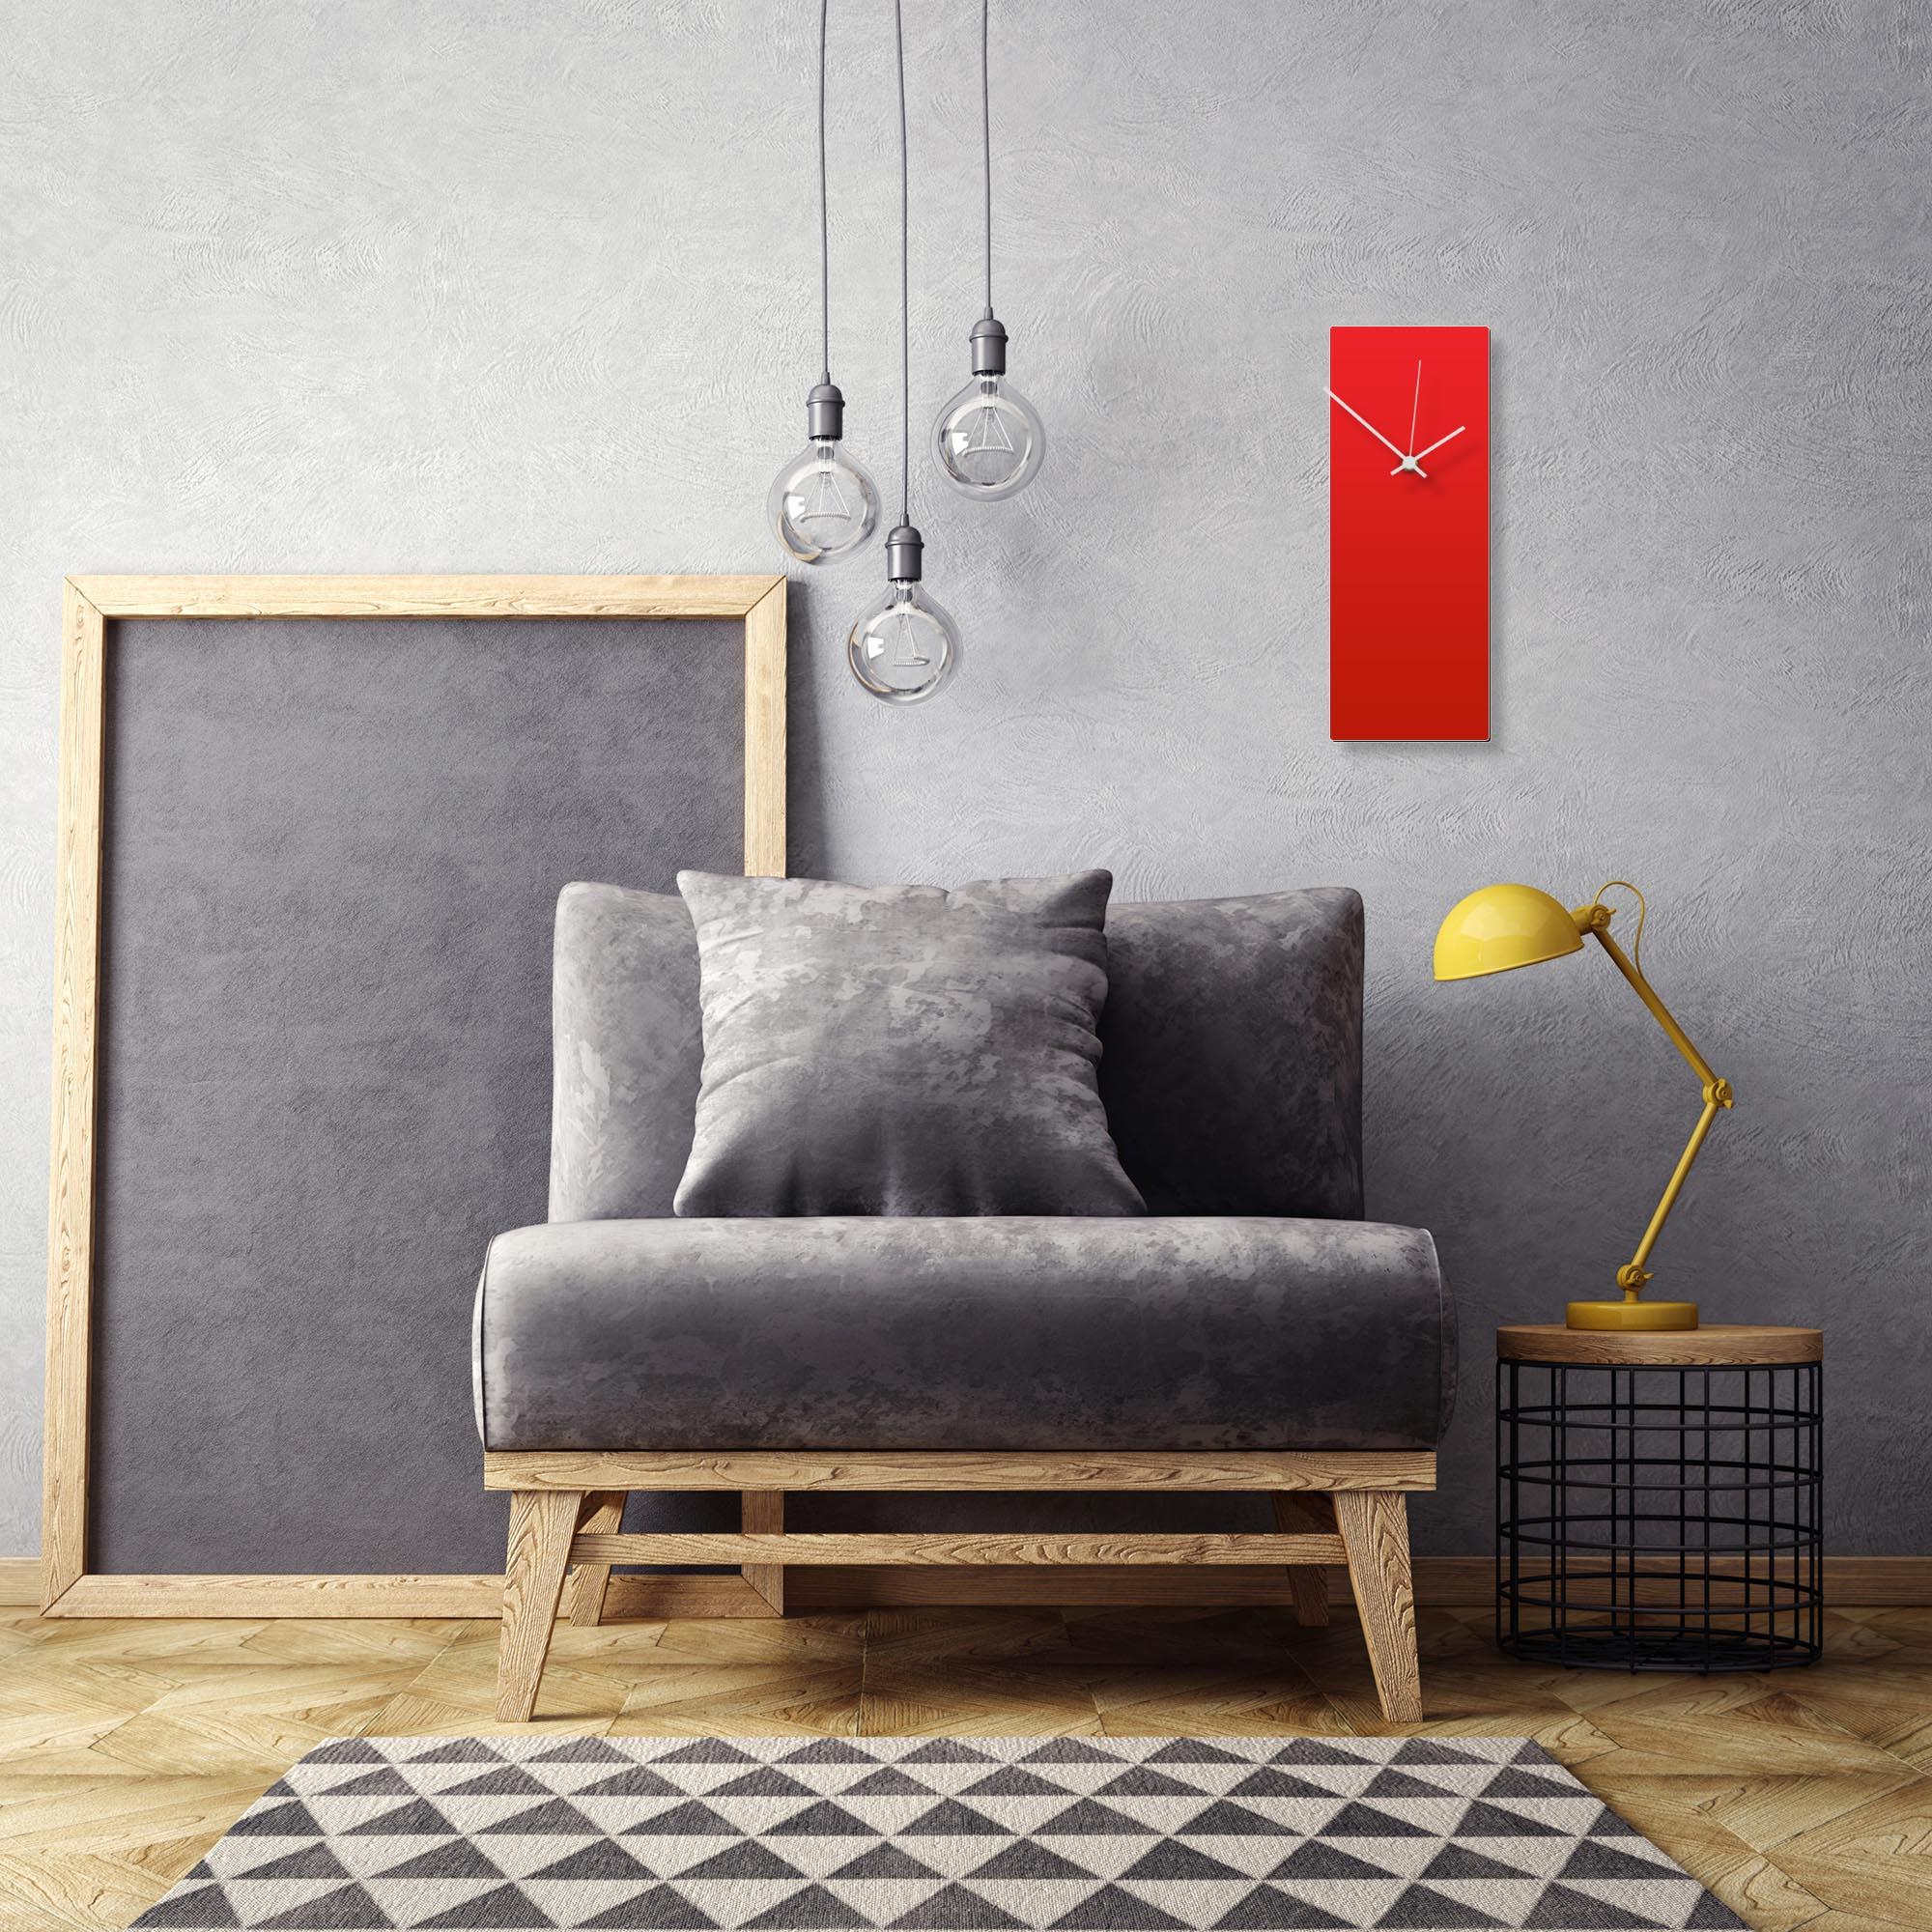 Redout White Clock by Adam Schwoeppe Contemporary Clock on Aluminum Polymetal - Alternate View 1